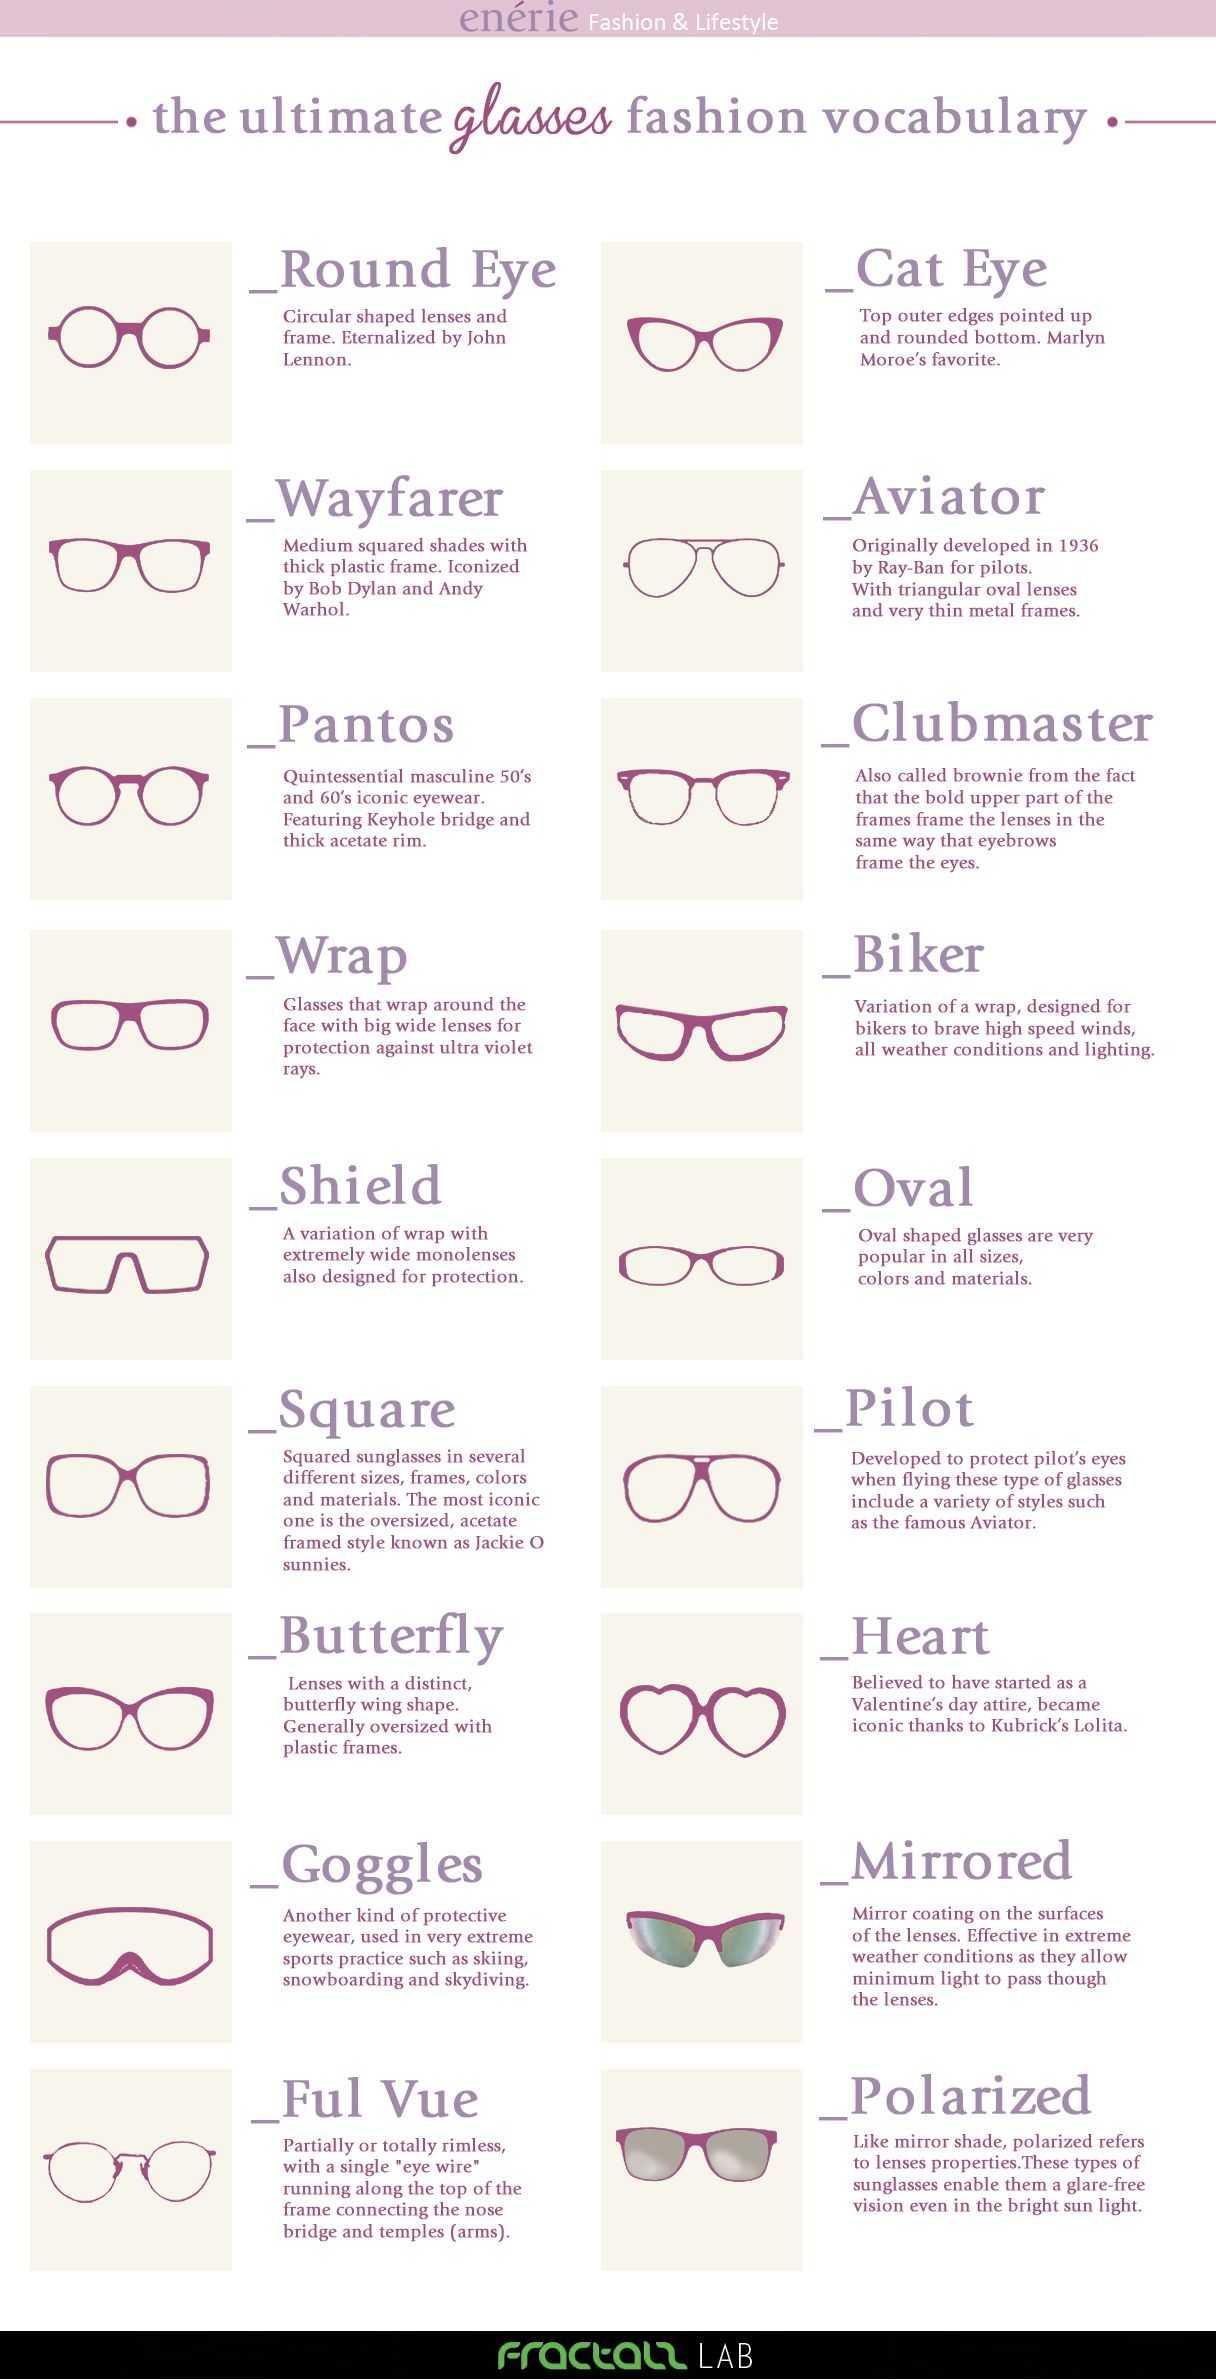 The Ultimate Glasses Fashion Vocabulary